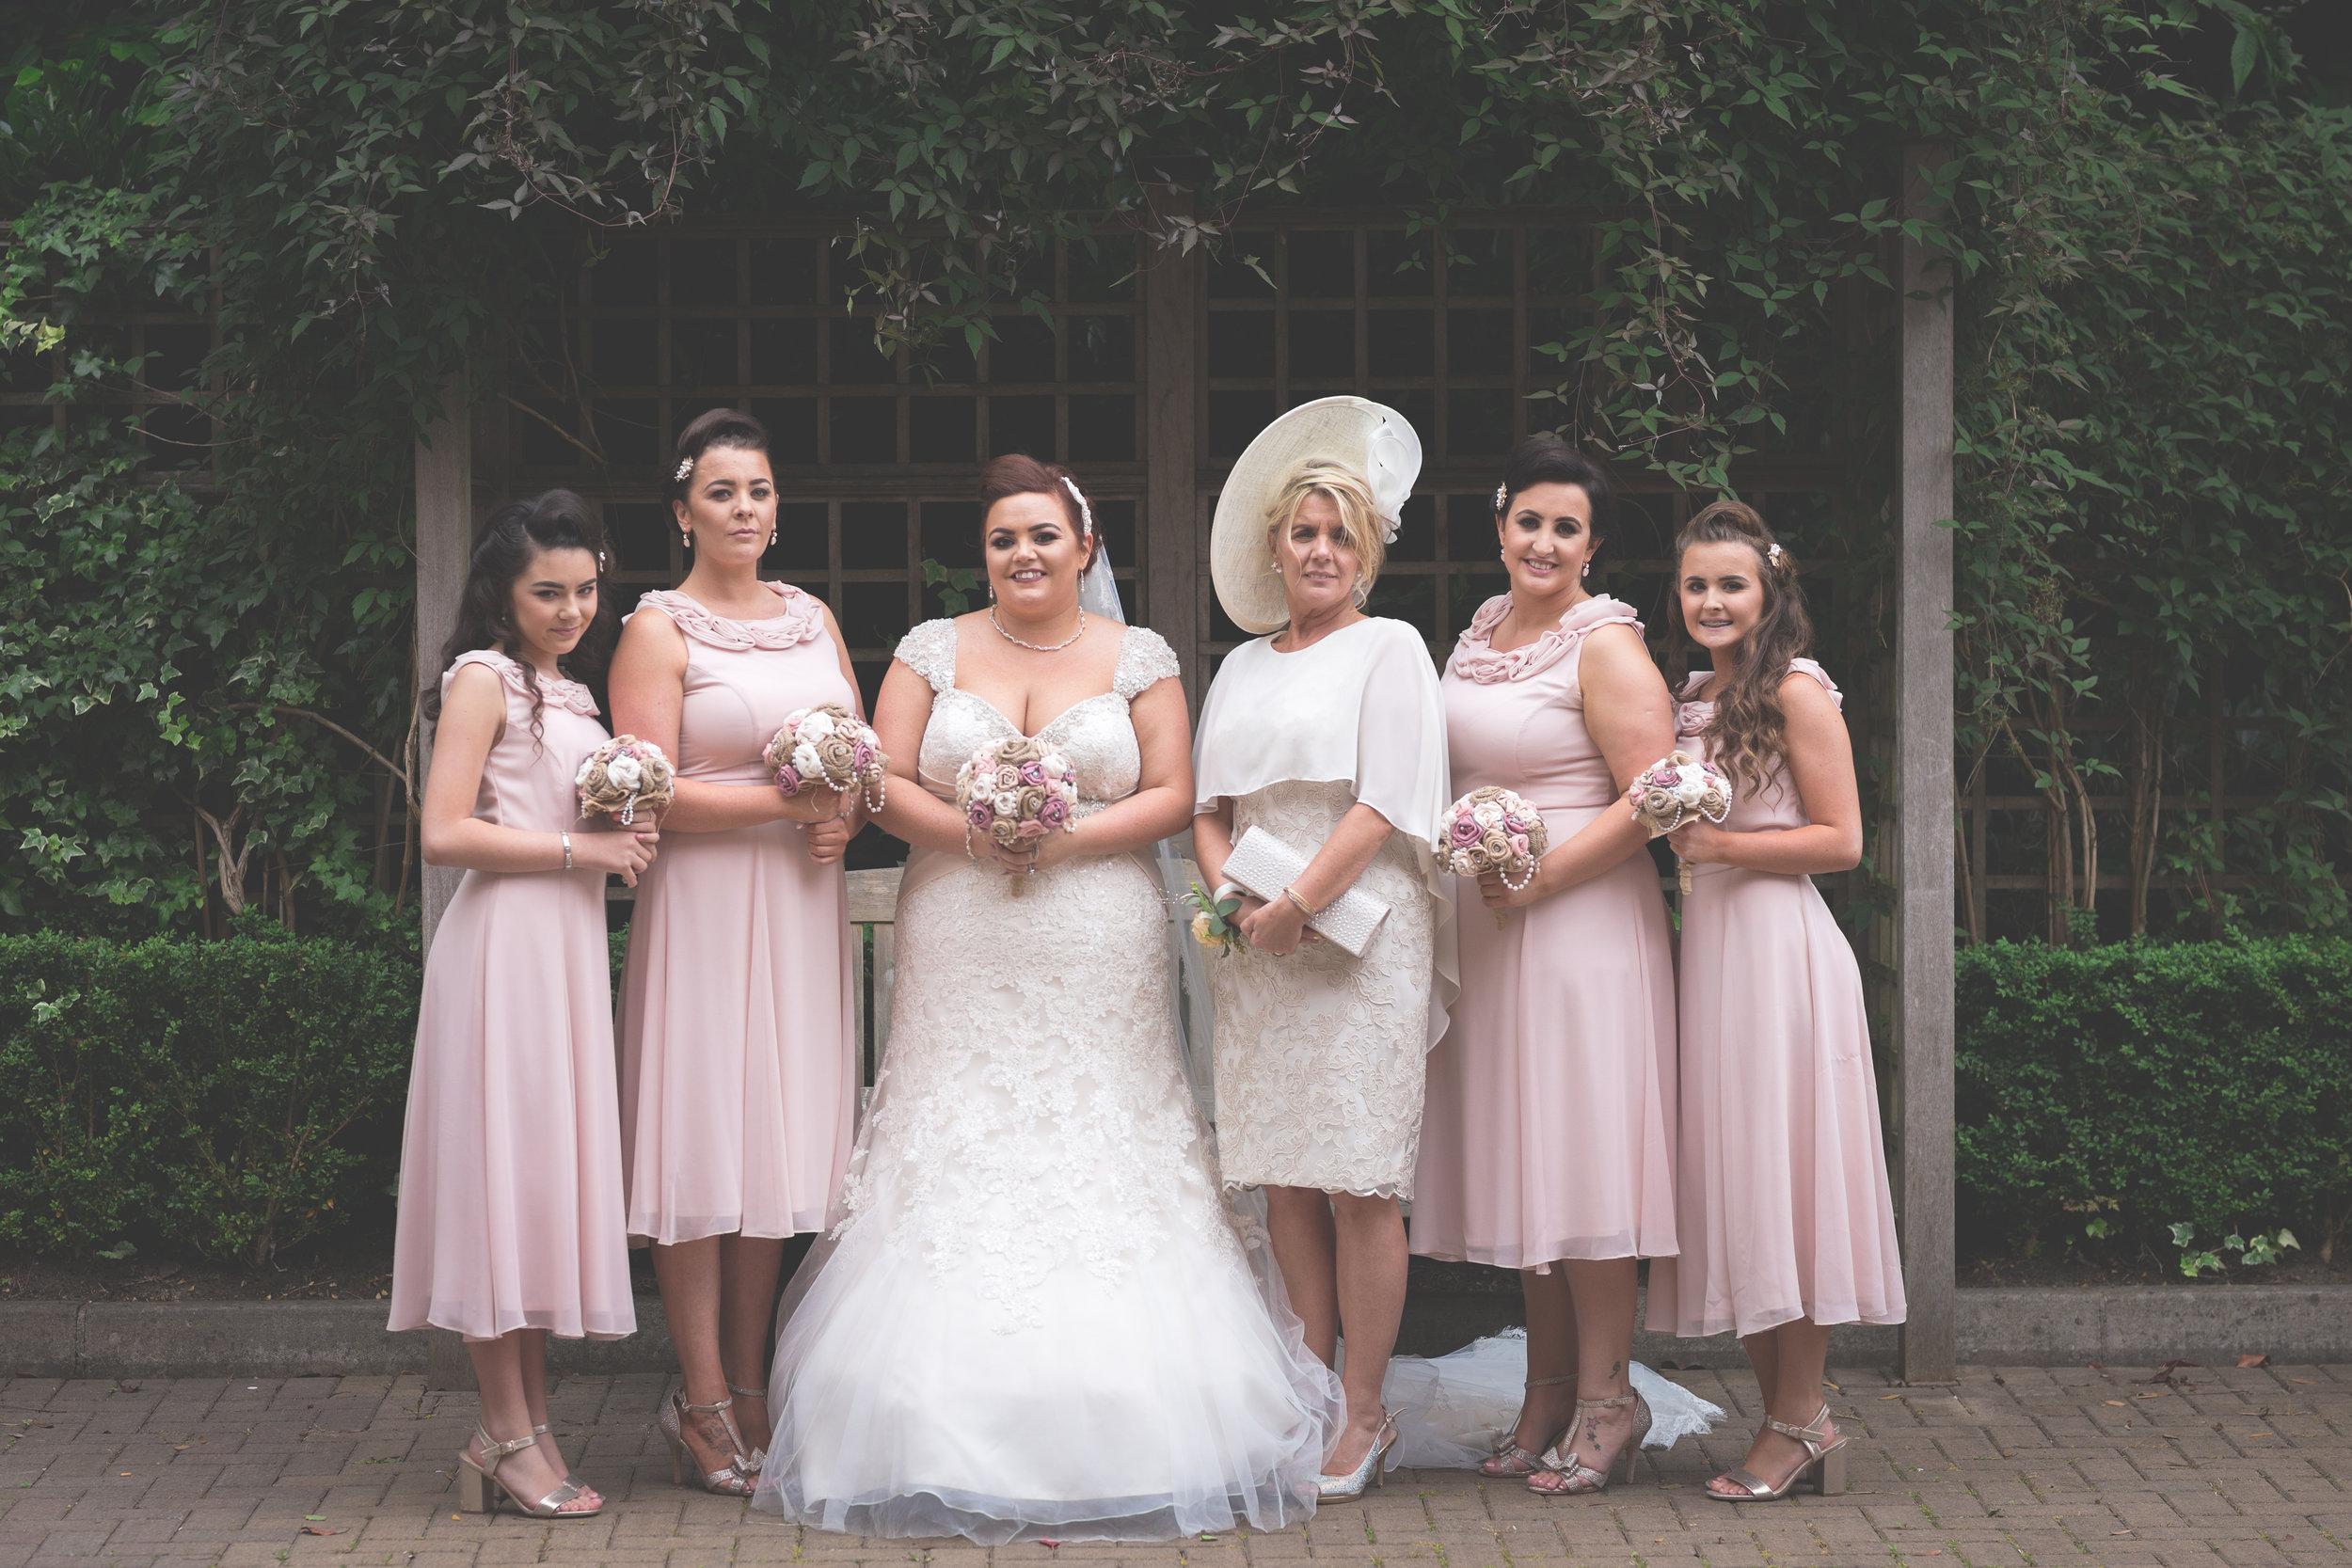 Antoinette & Stephen - Portraits   Brian McEwan Photography   Wedding Photographer Northern Ireland 59.jpg